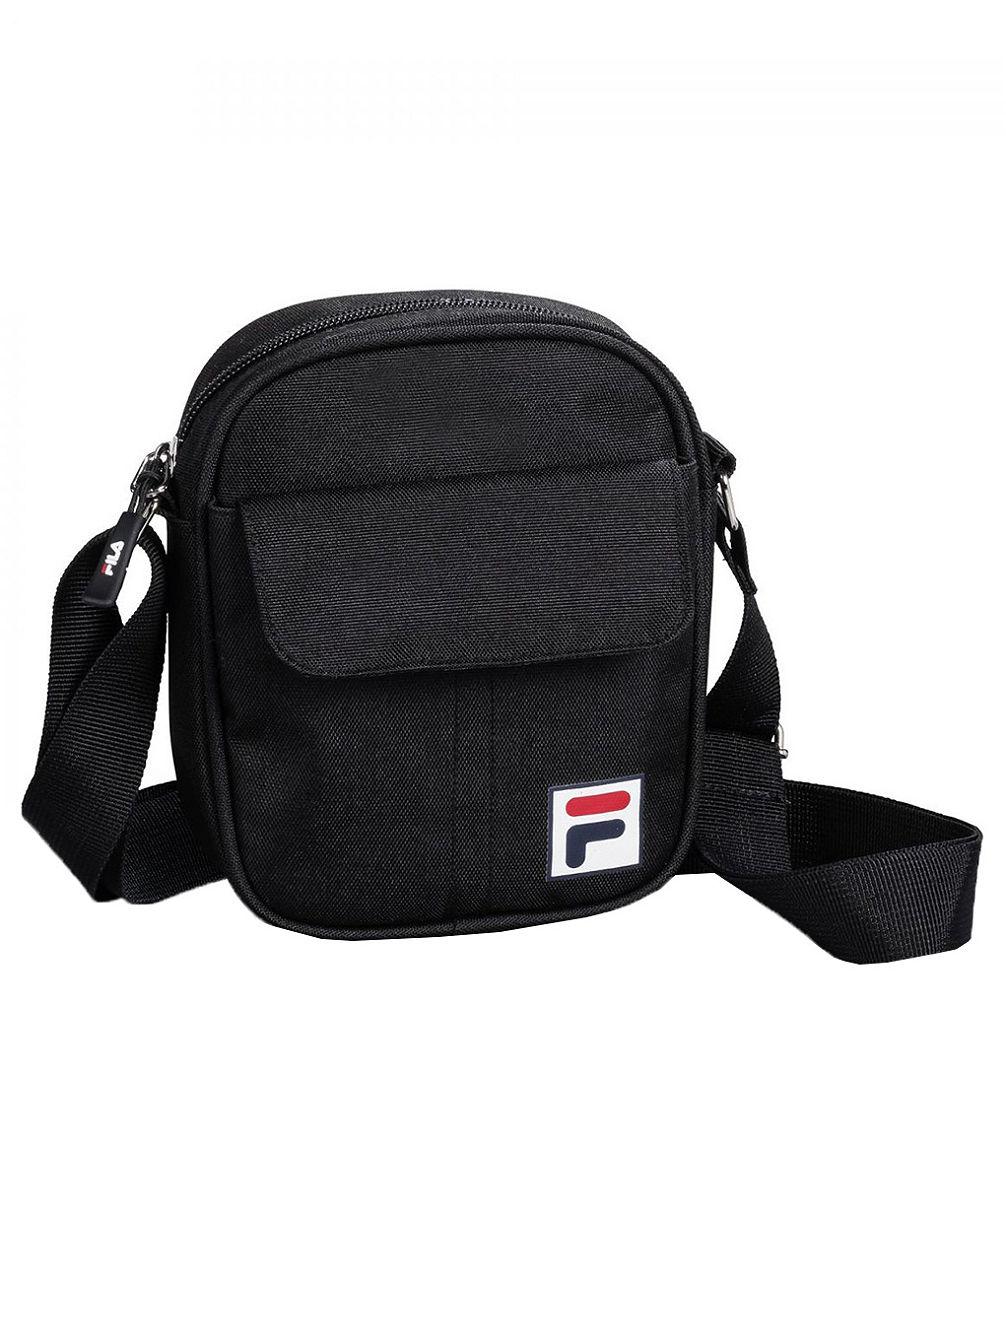 Buy Fila Pusher 2 Milan Bag online at blue-tomato.com cc01effeae